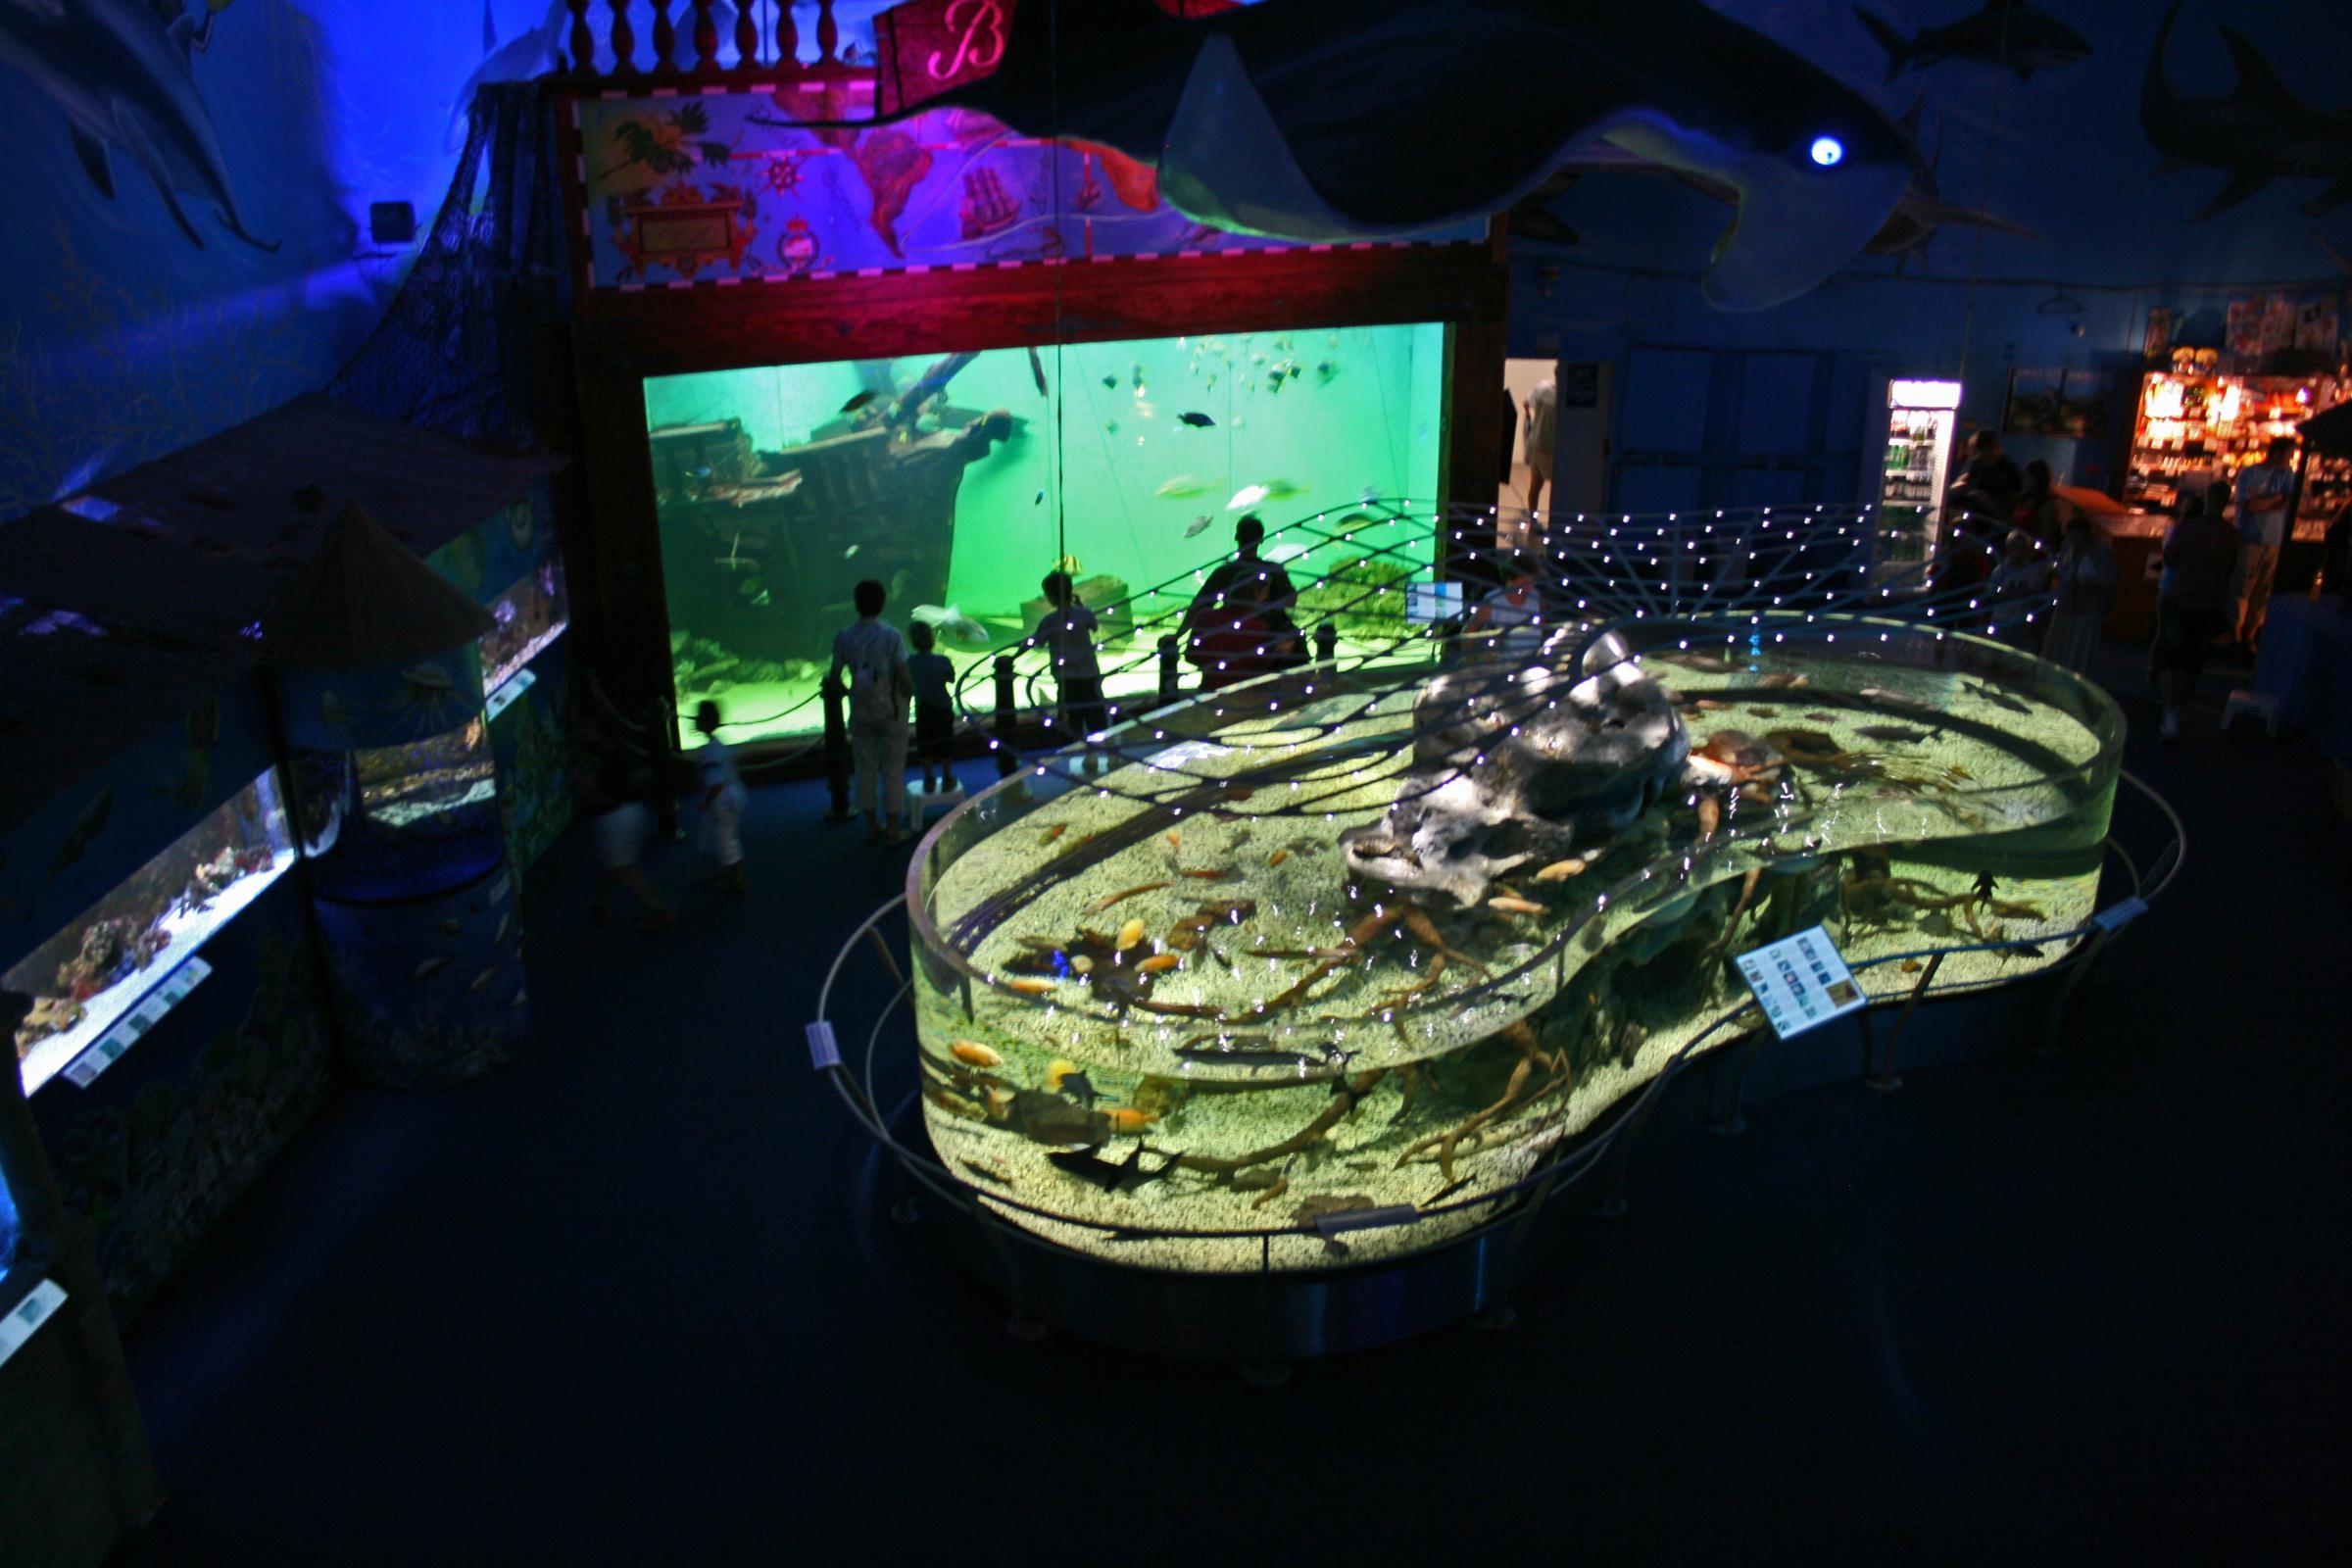 Ressources ducatives libres les for Aquarium interieur